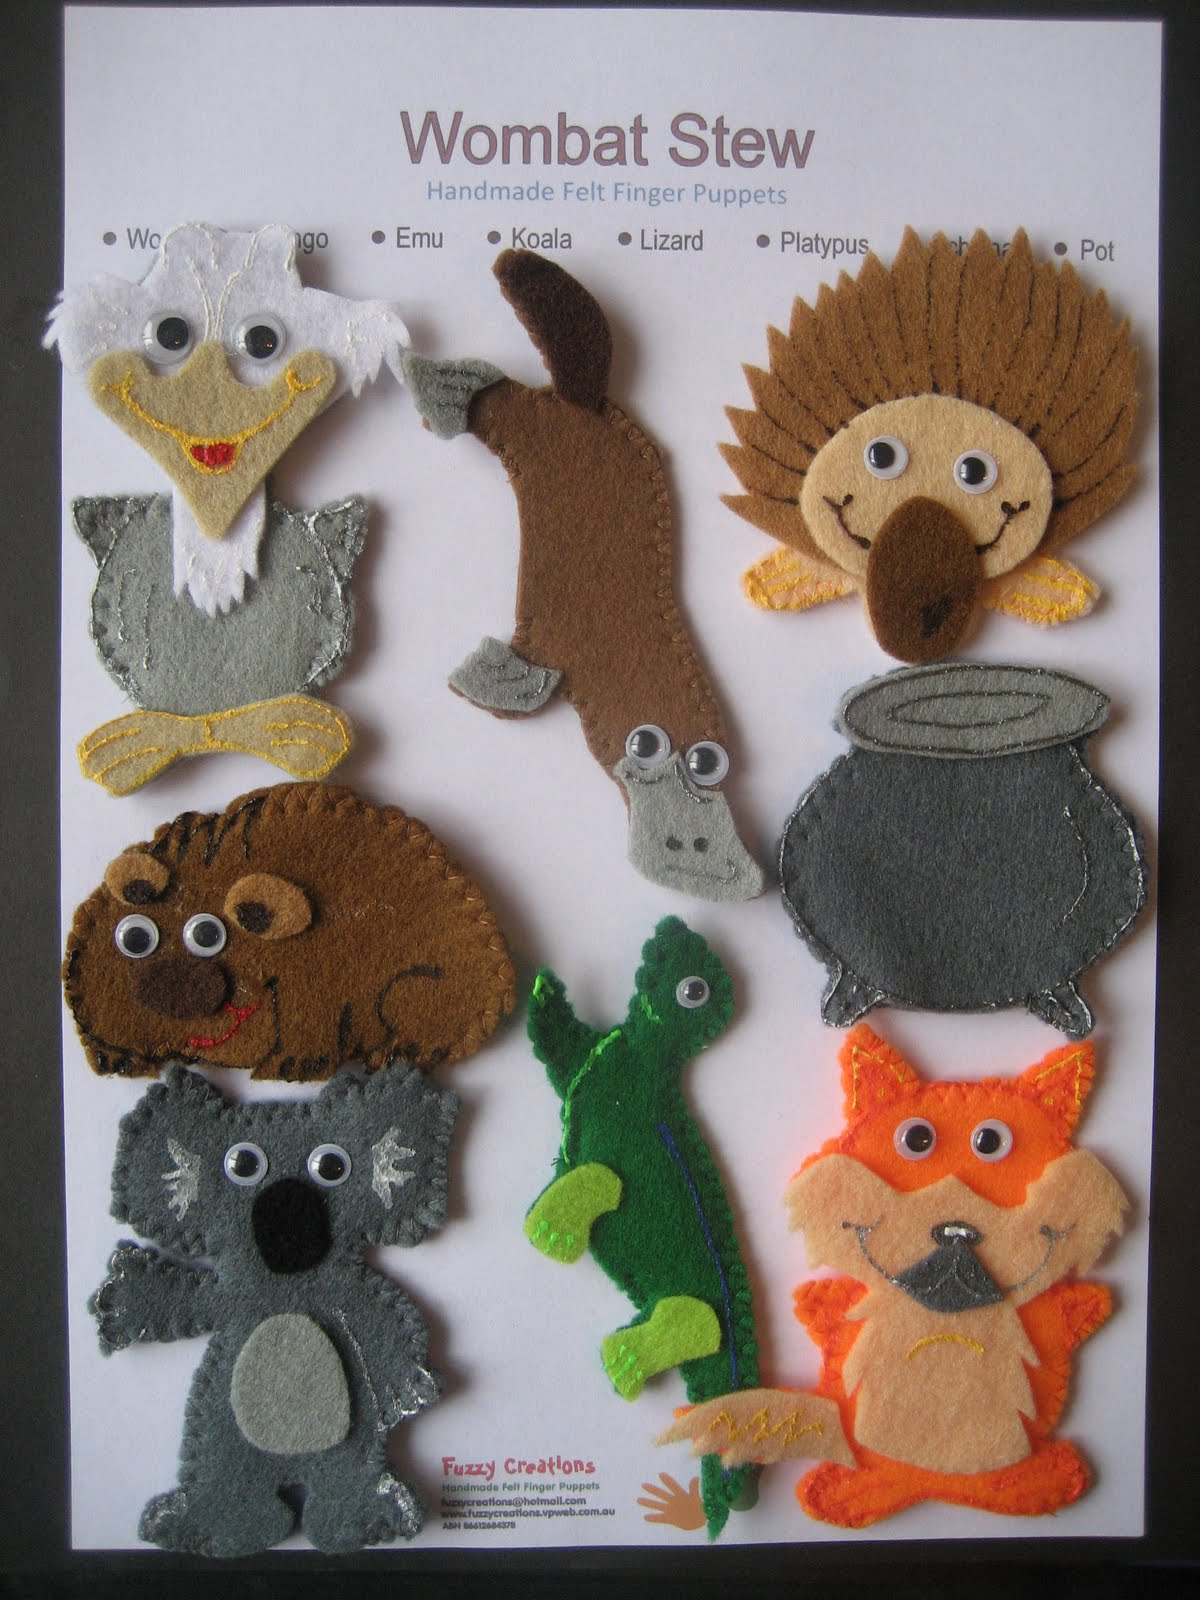 Wombat Stew Masks Templates - Yardarm.